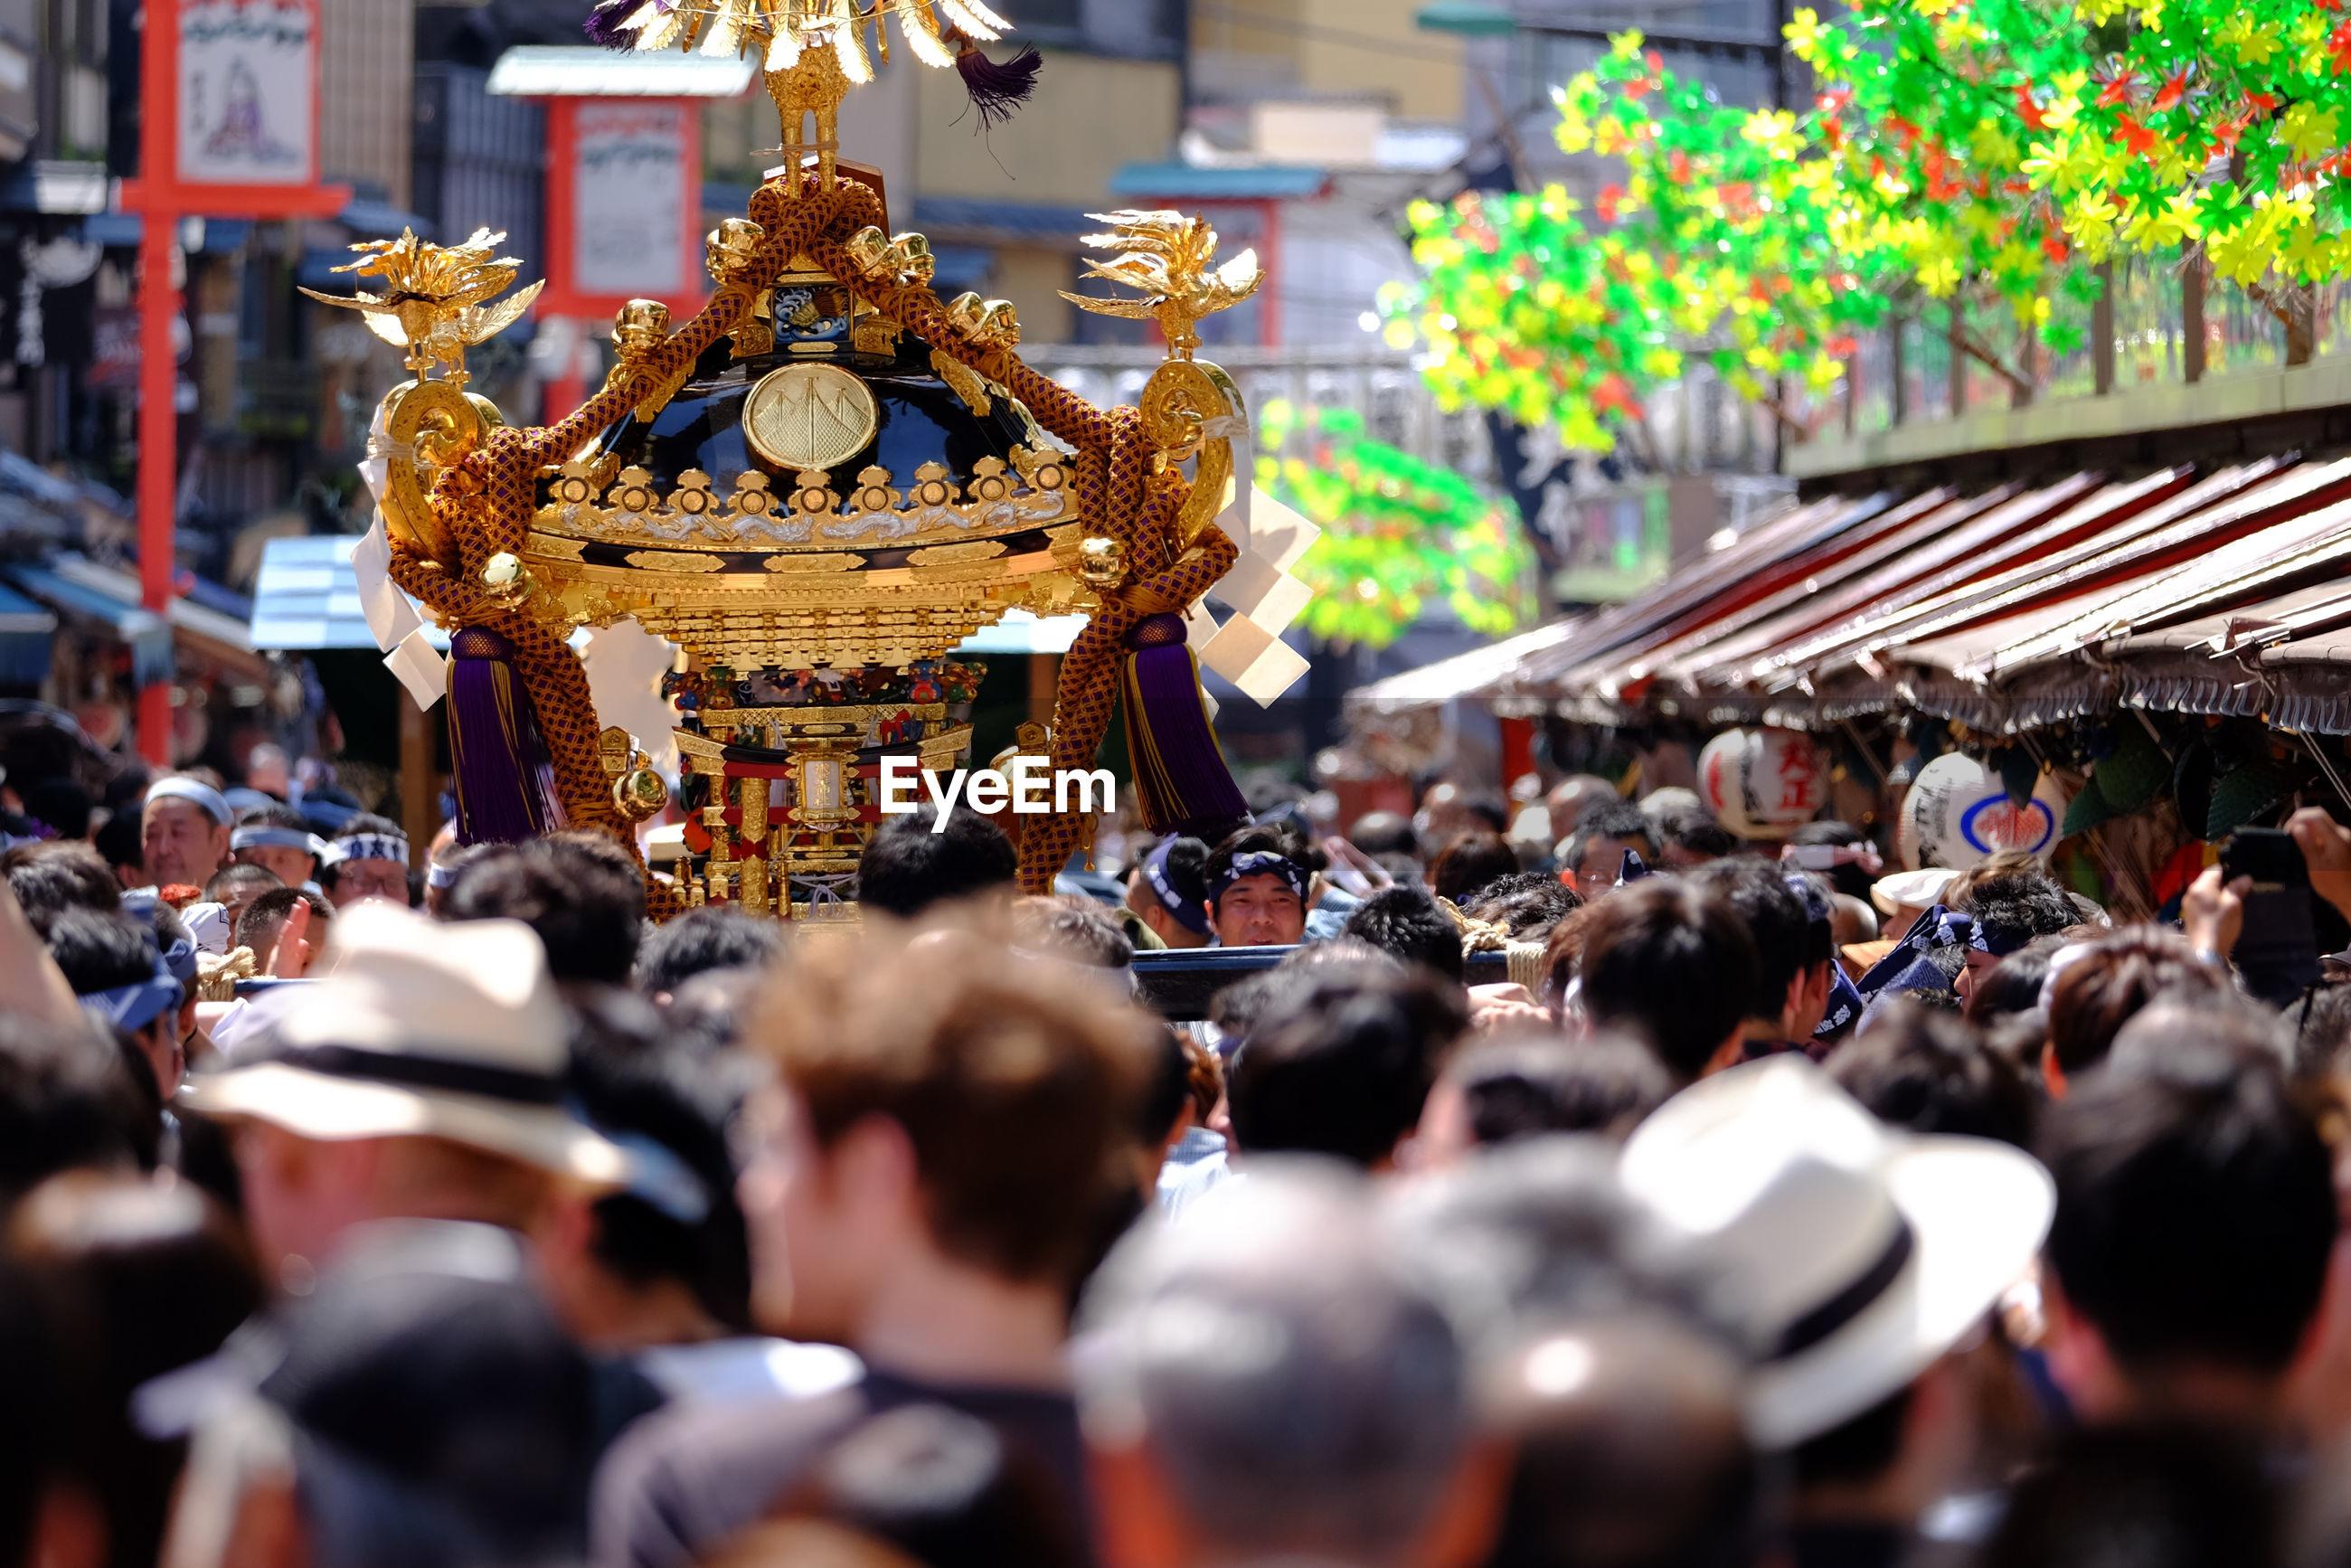 Crowd on street during mikoshi festival